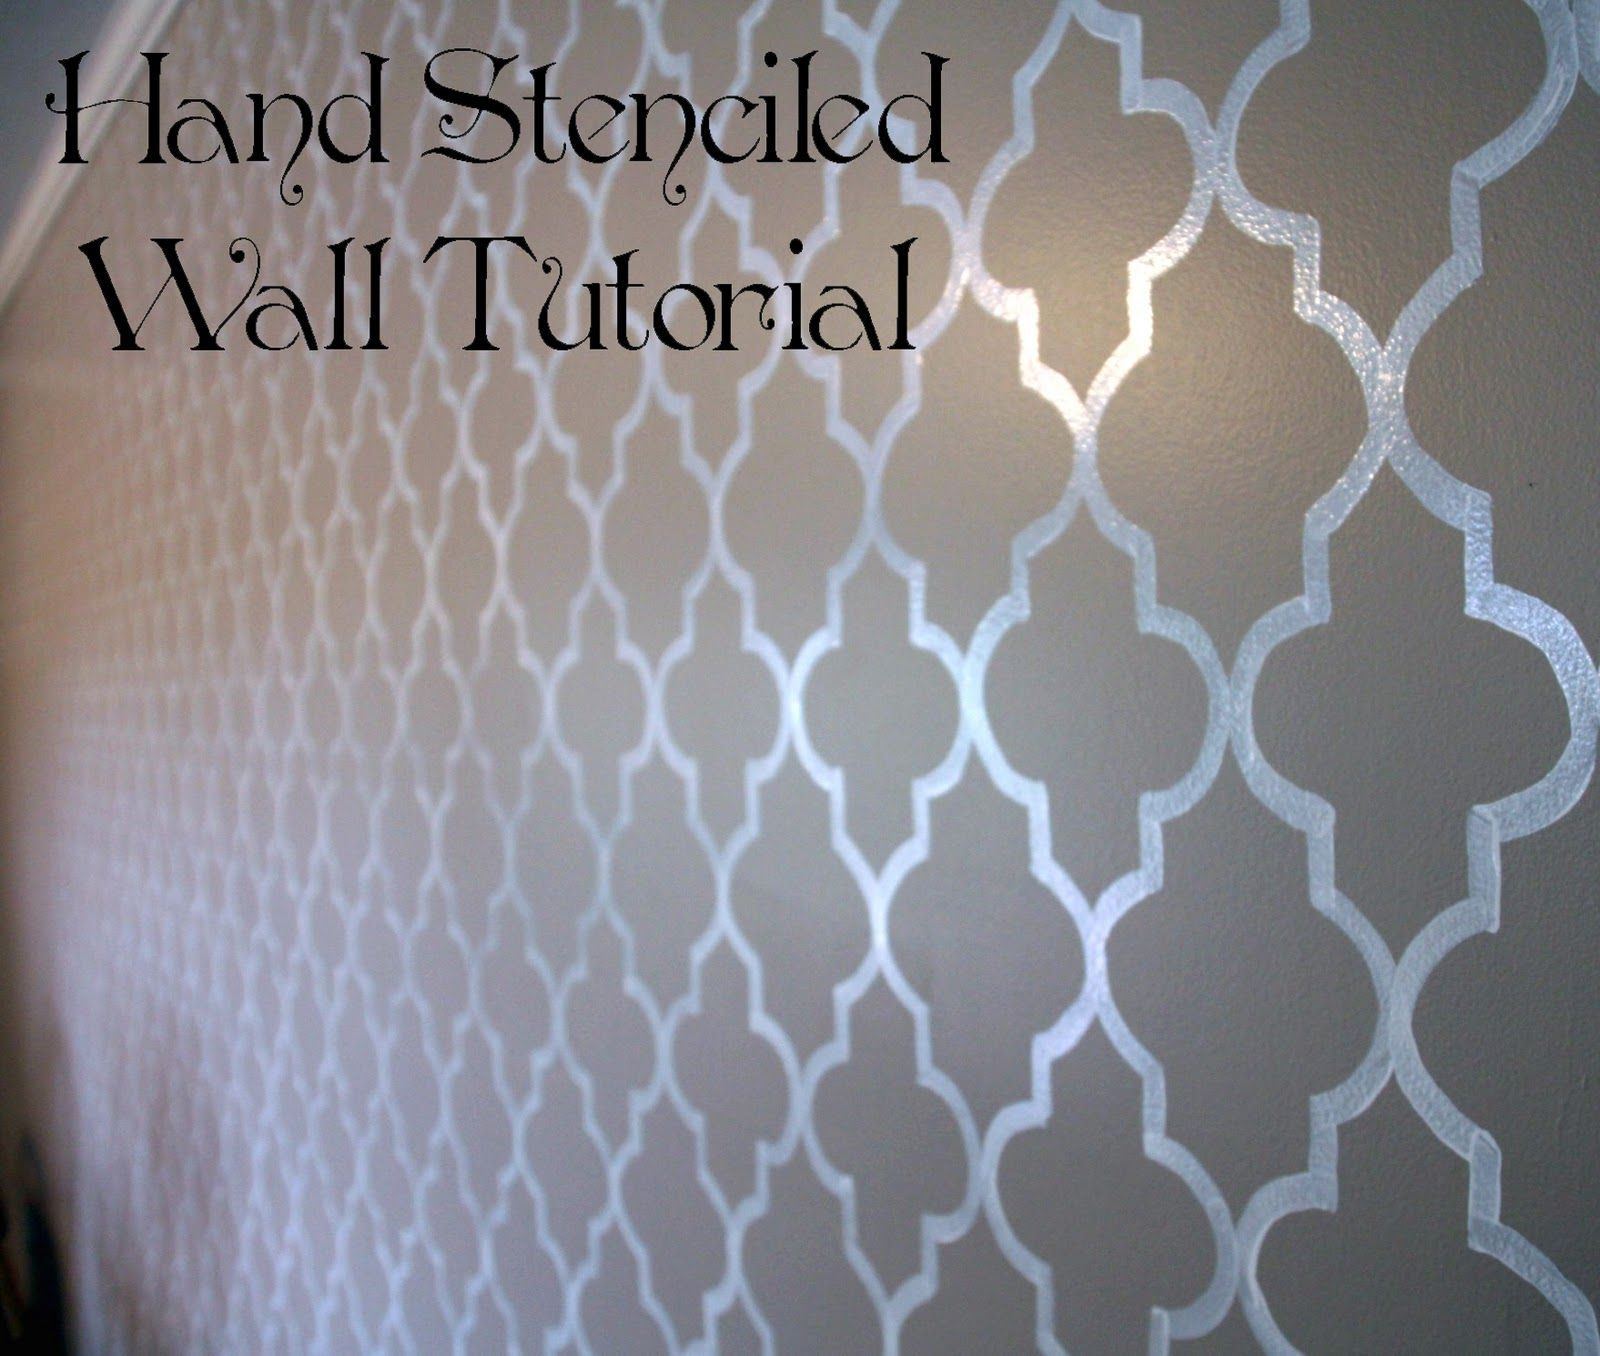 Free Wall Stencils | Wall Covering Ideas | Pinterest | Stencils - Free Printable Wall Stencils For Painting